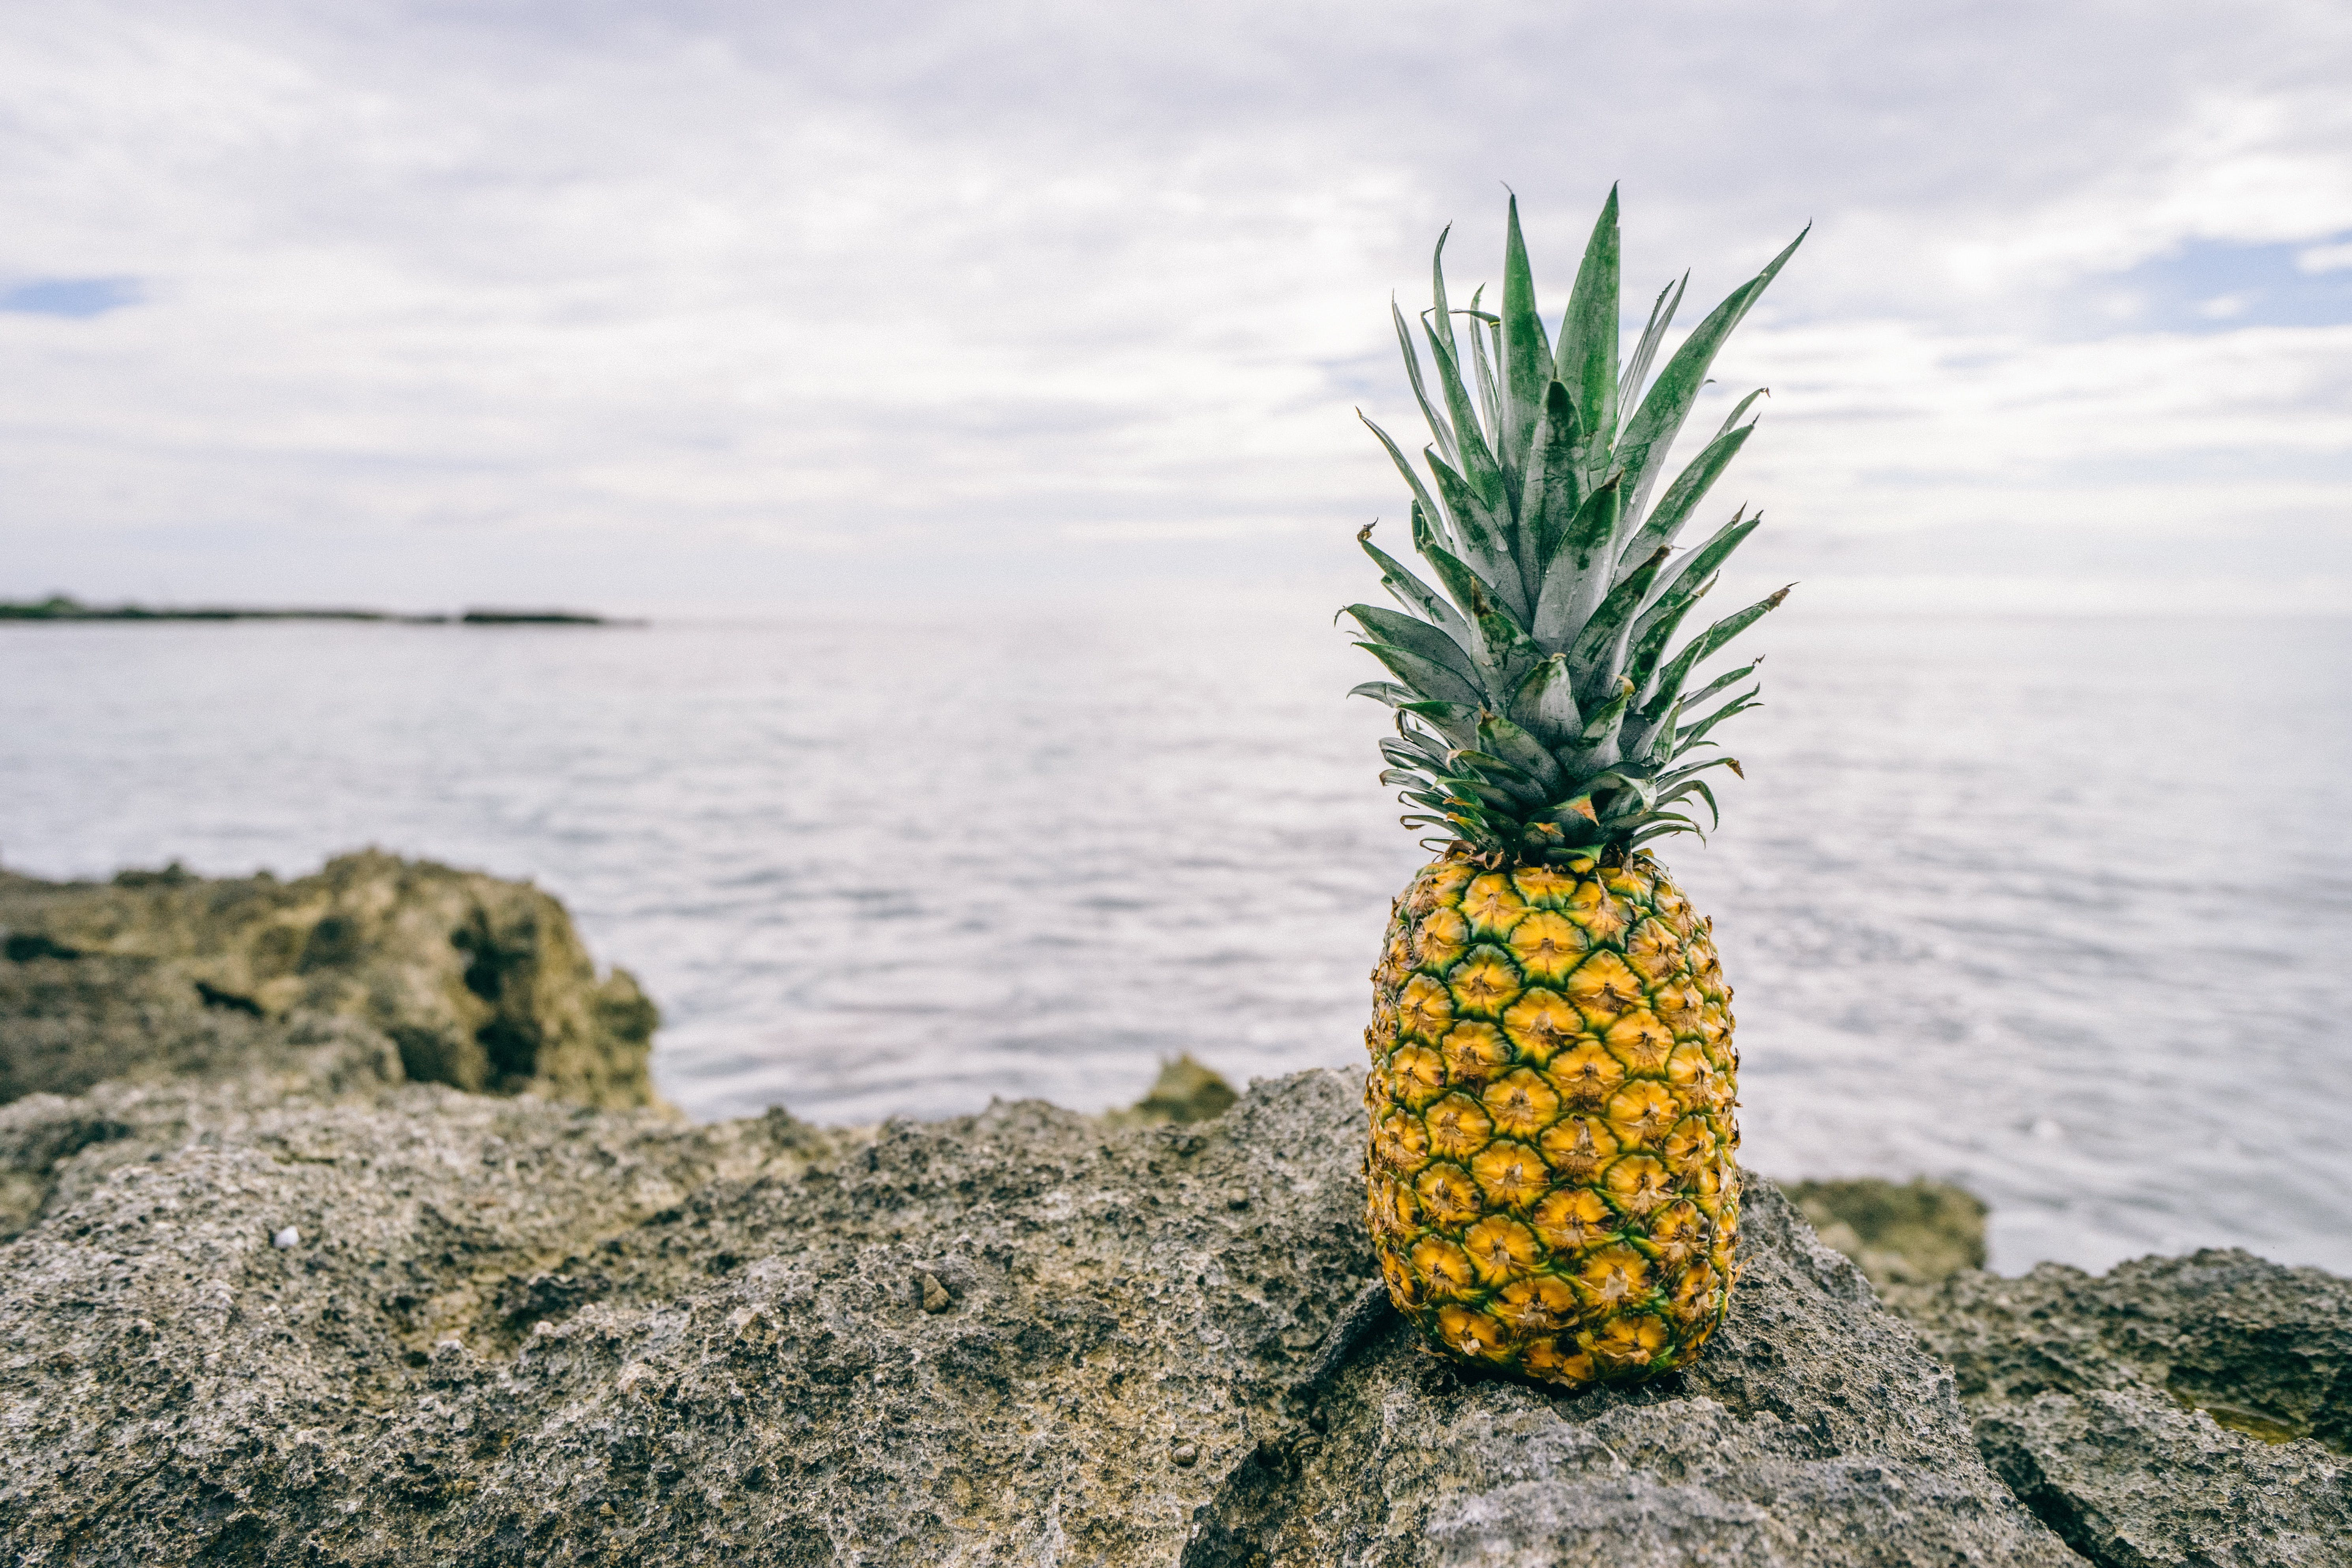 Gratis stockfoto met ananas, fruit, h2o, kustlijn